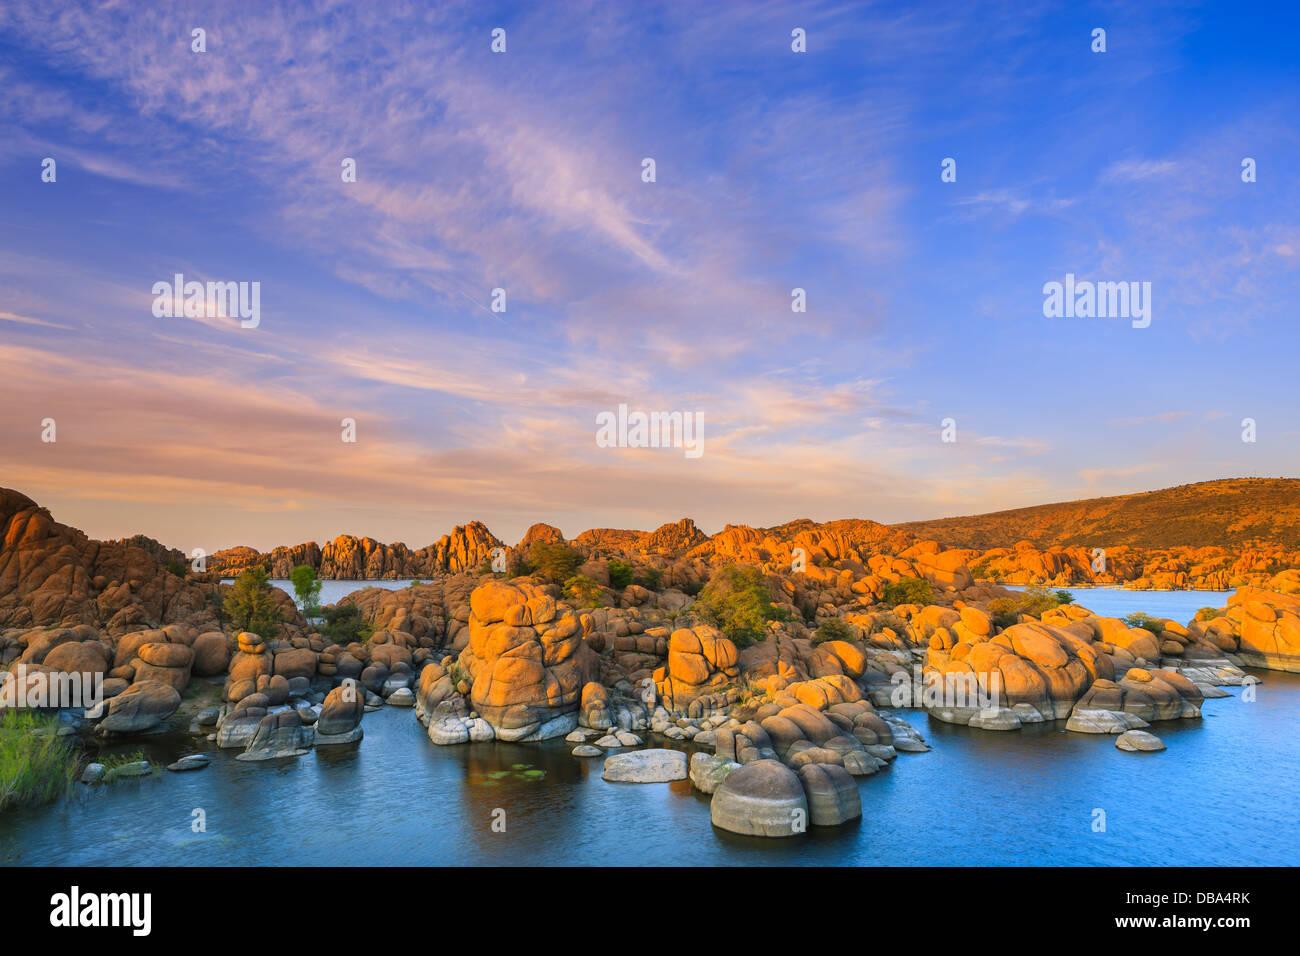 Coucher de soleil sur Watson Lake près de Prescott, Arizona Photo Stock